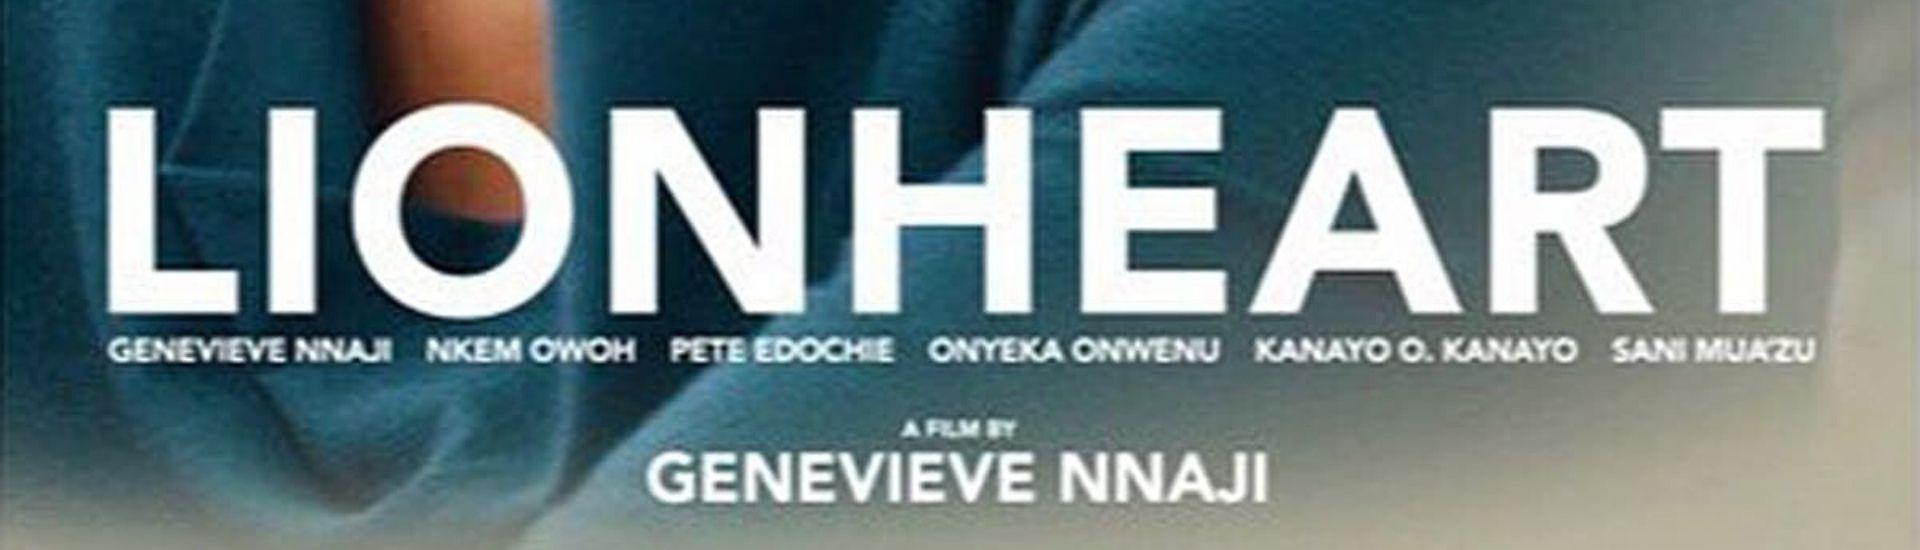 Lionheart de Genevieve Nnaji